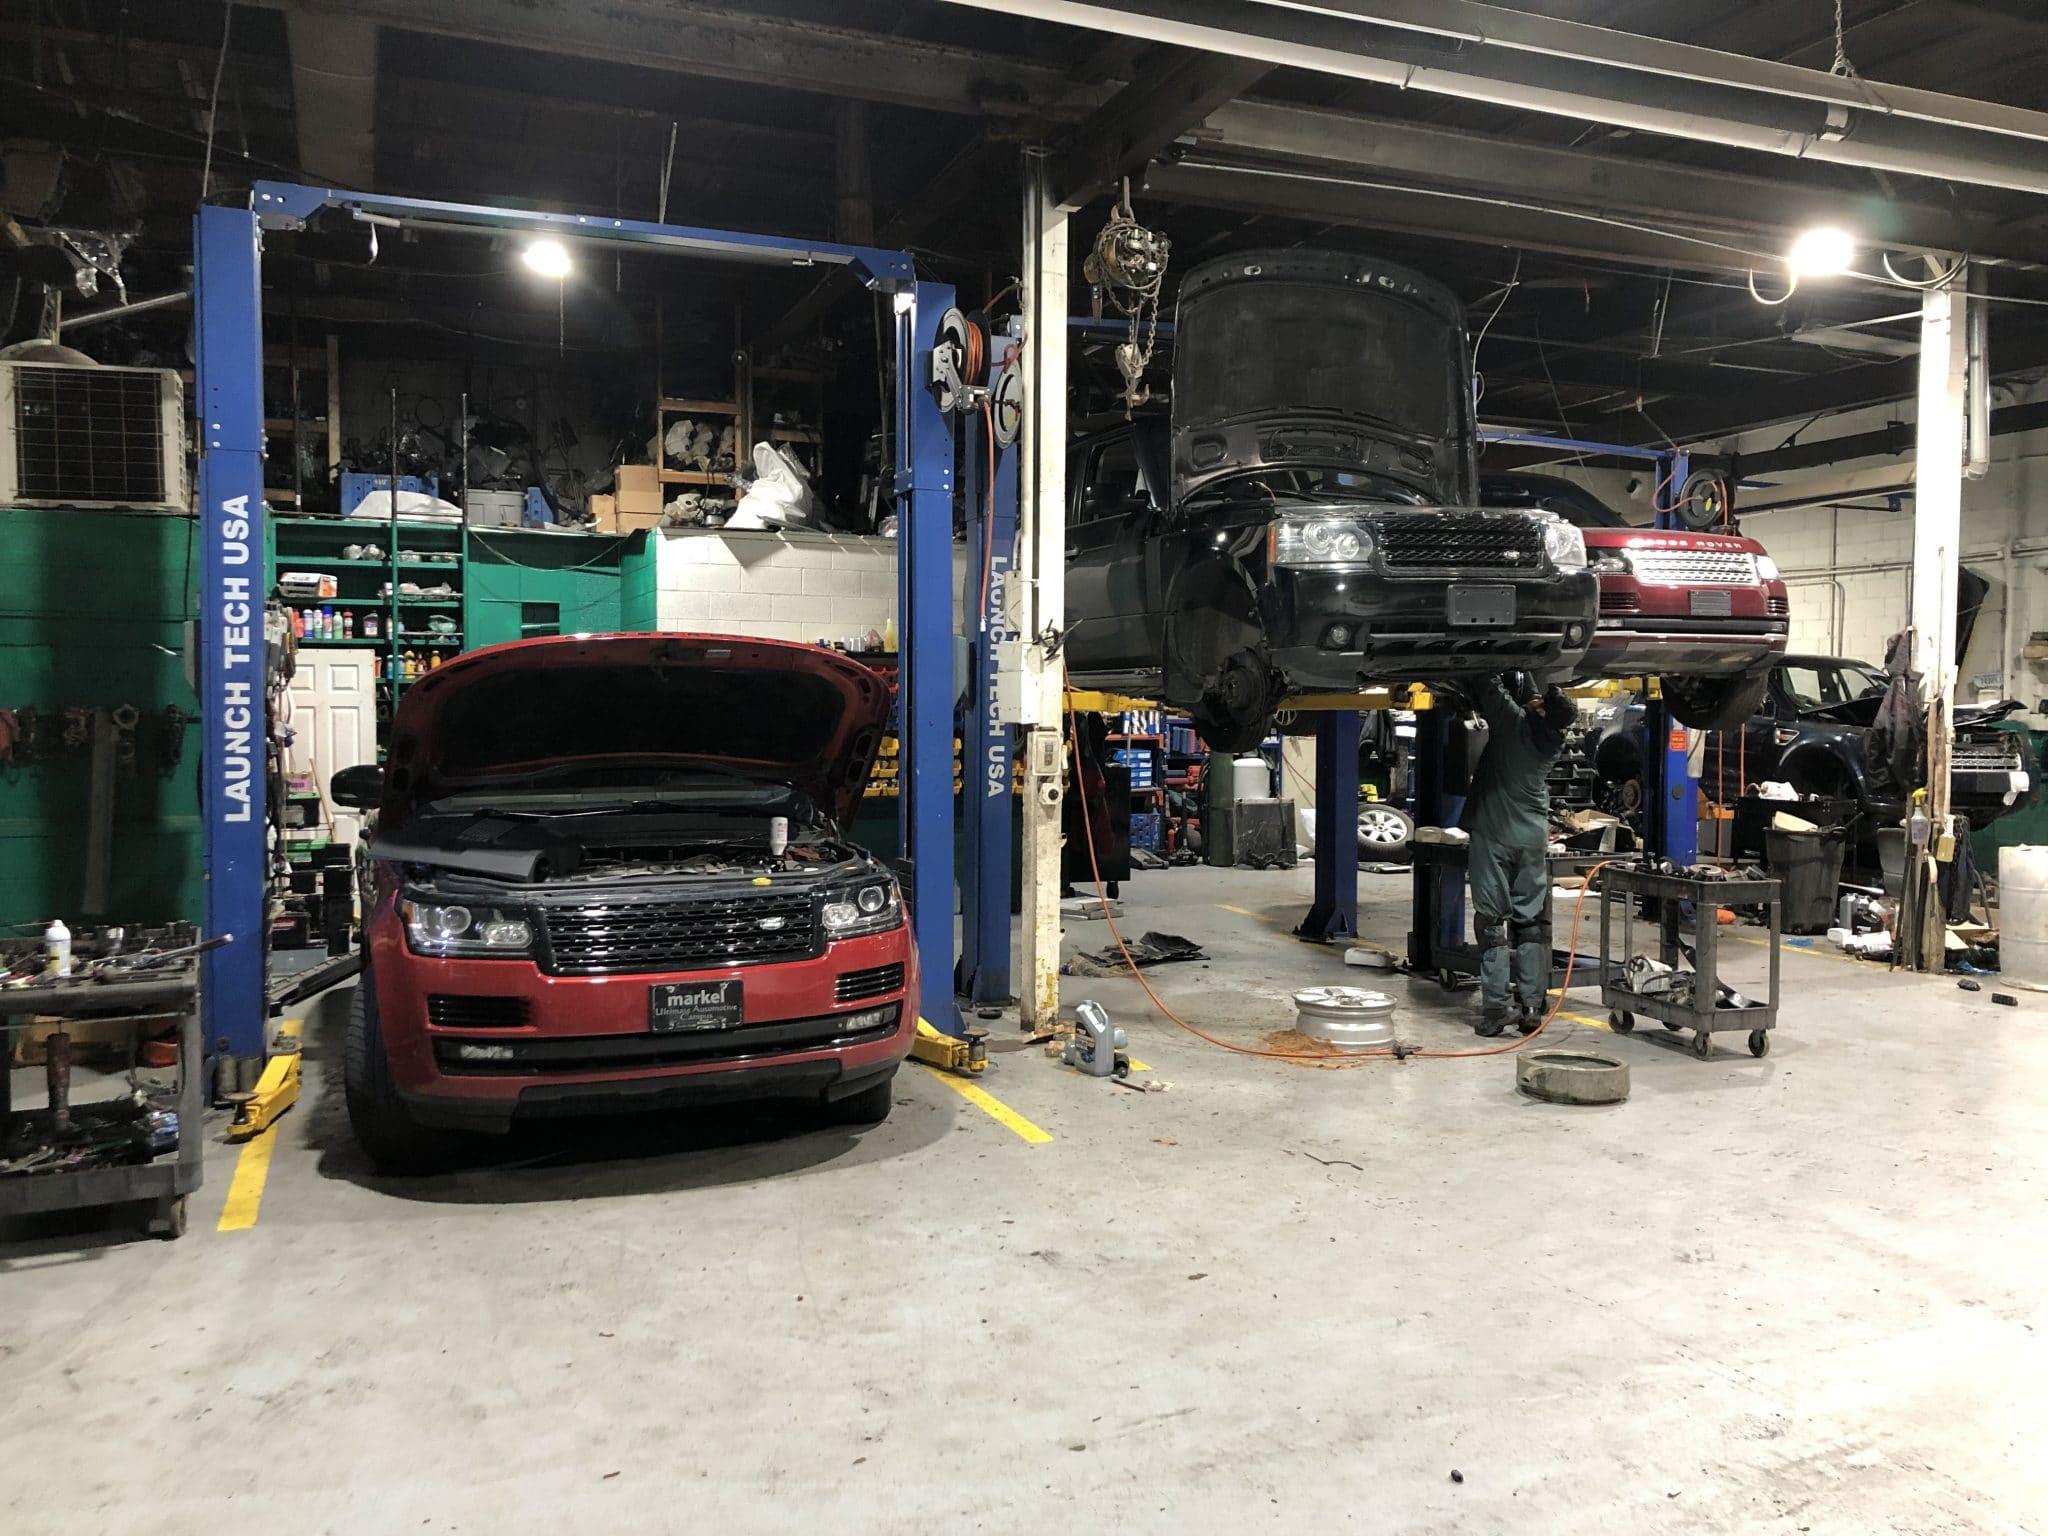 Roverland Repair Shop Inside